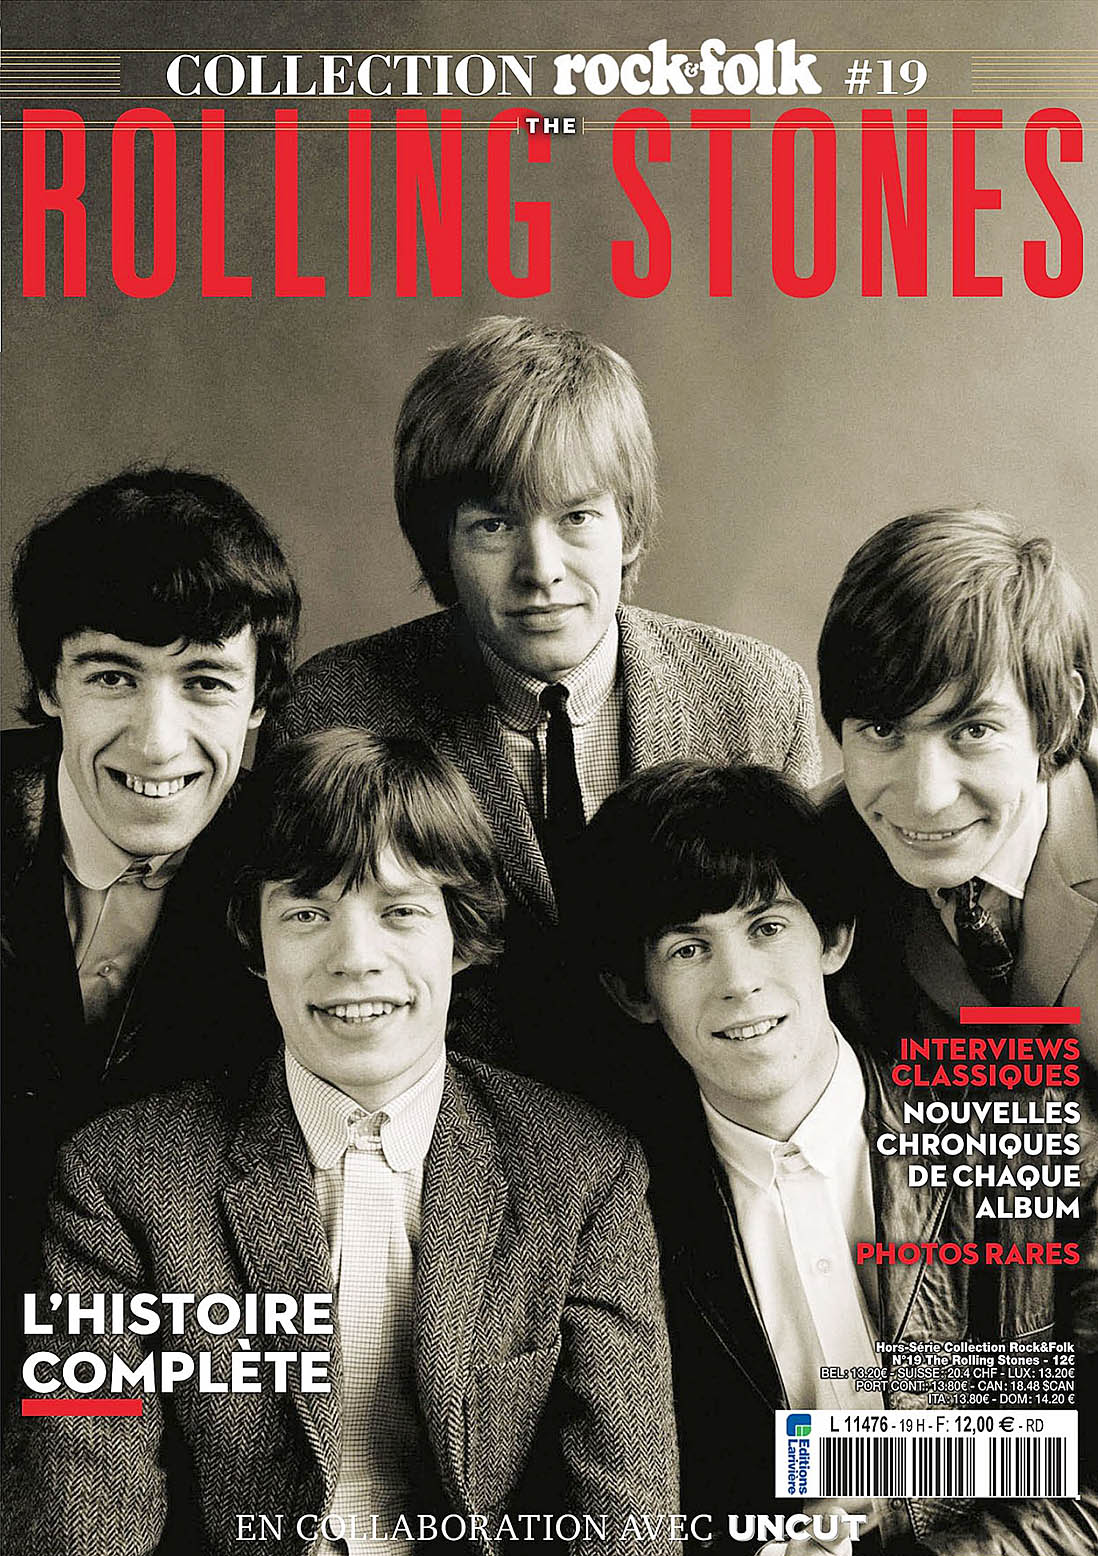 Rock and Folk Sp 19 2021 Rolling Stones.jpg